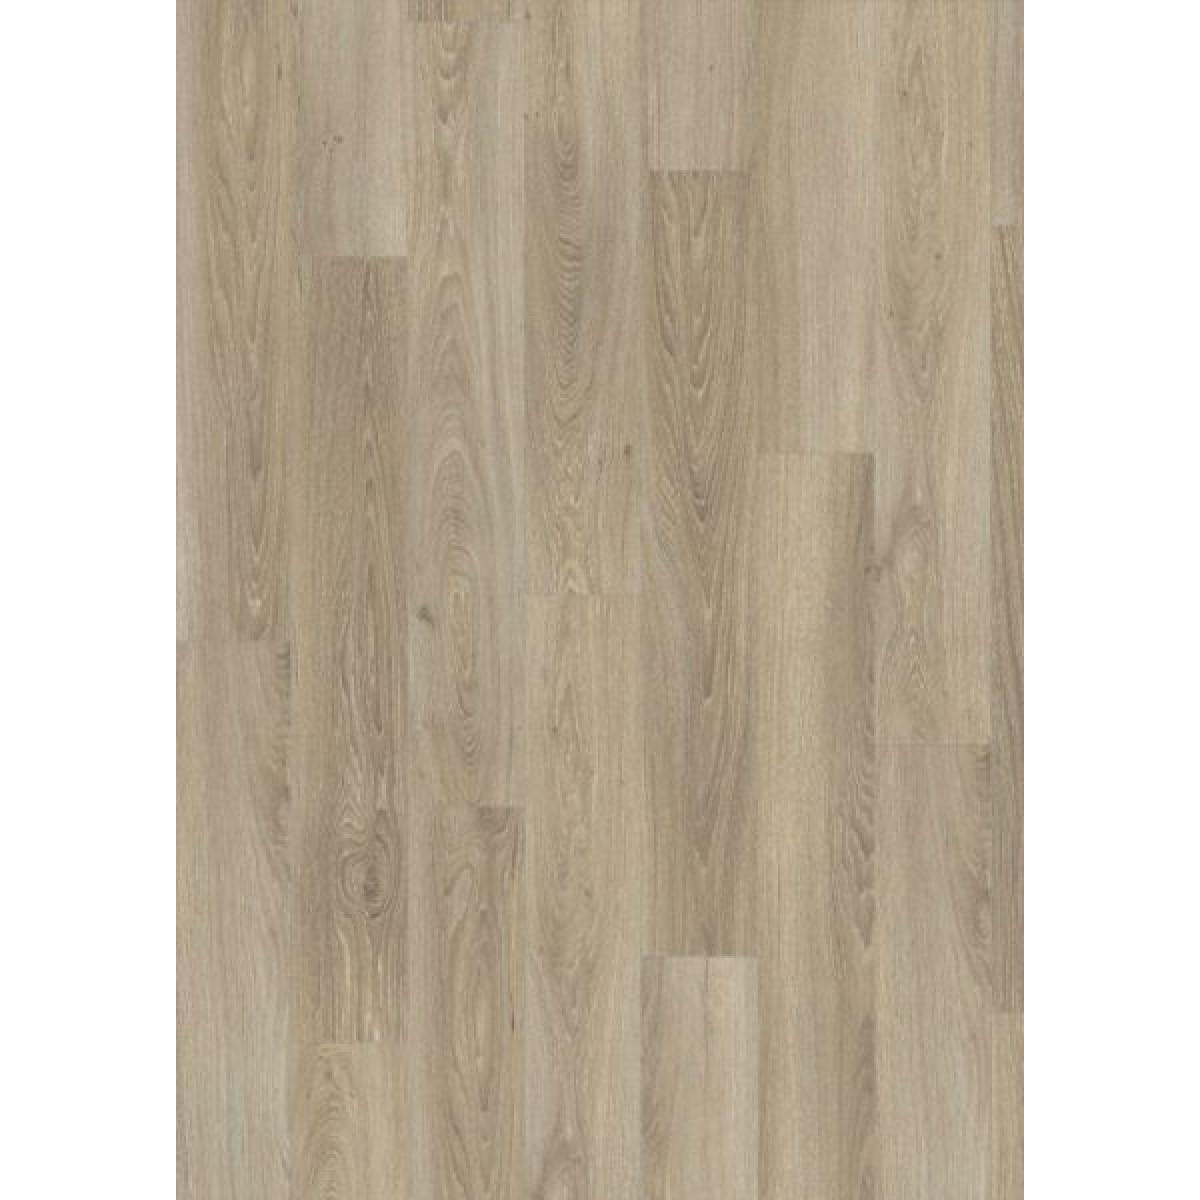 Comlaminate Flooring Packs : Egger Plank Laminate Flooring, All flooring is priced per pack.